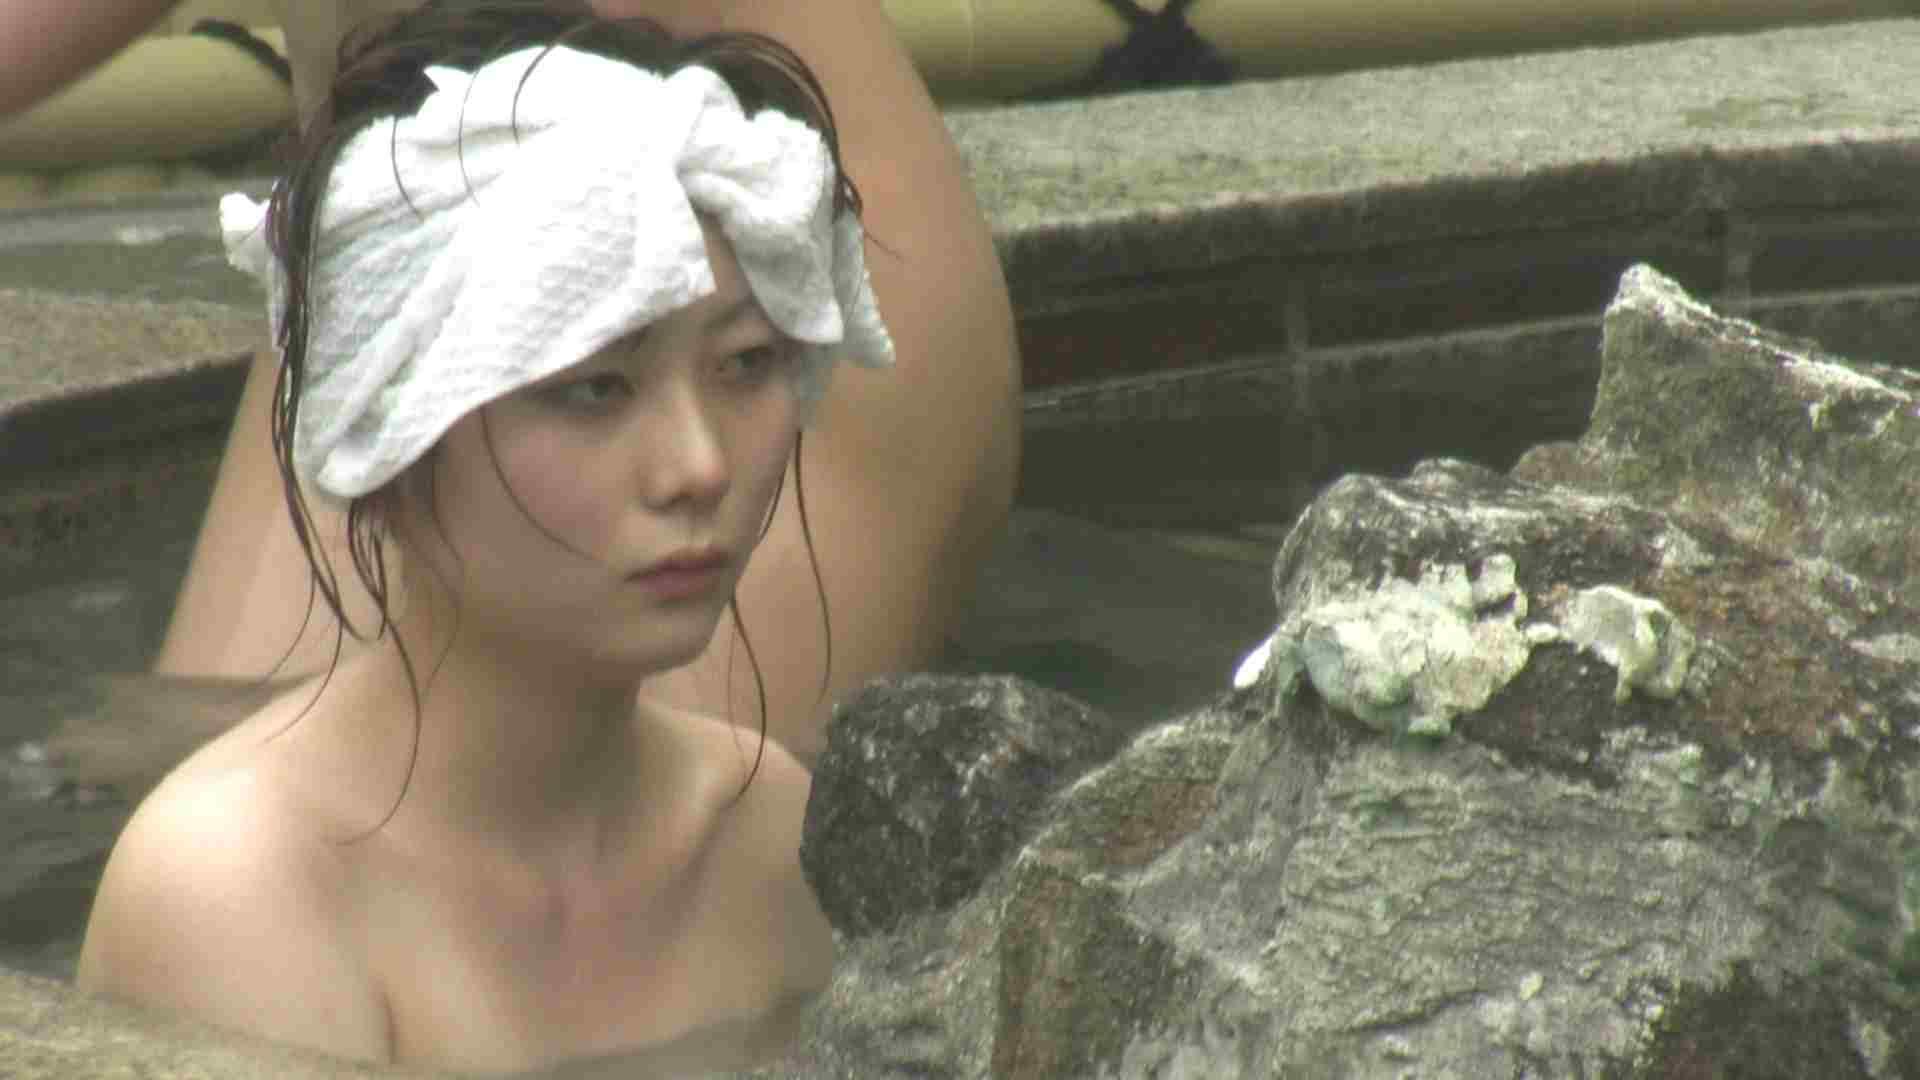 Aquaな露天風呂Vol.147 盗撮シリーズ | 露天風呂編  80PIX 23